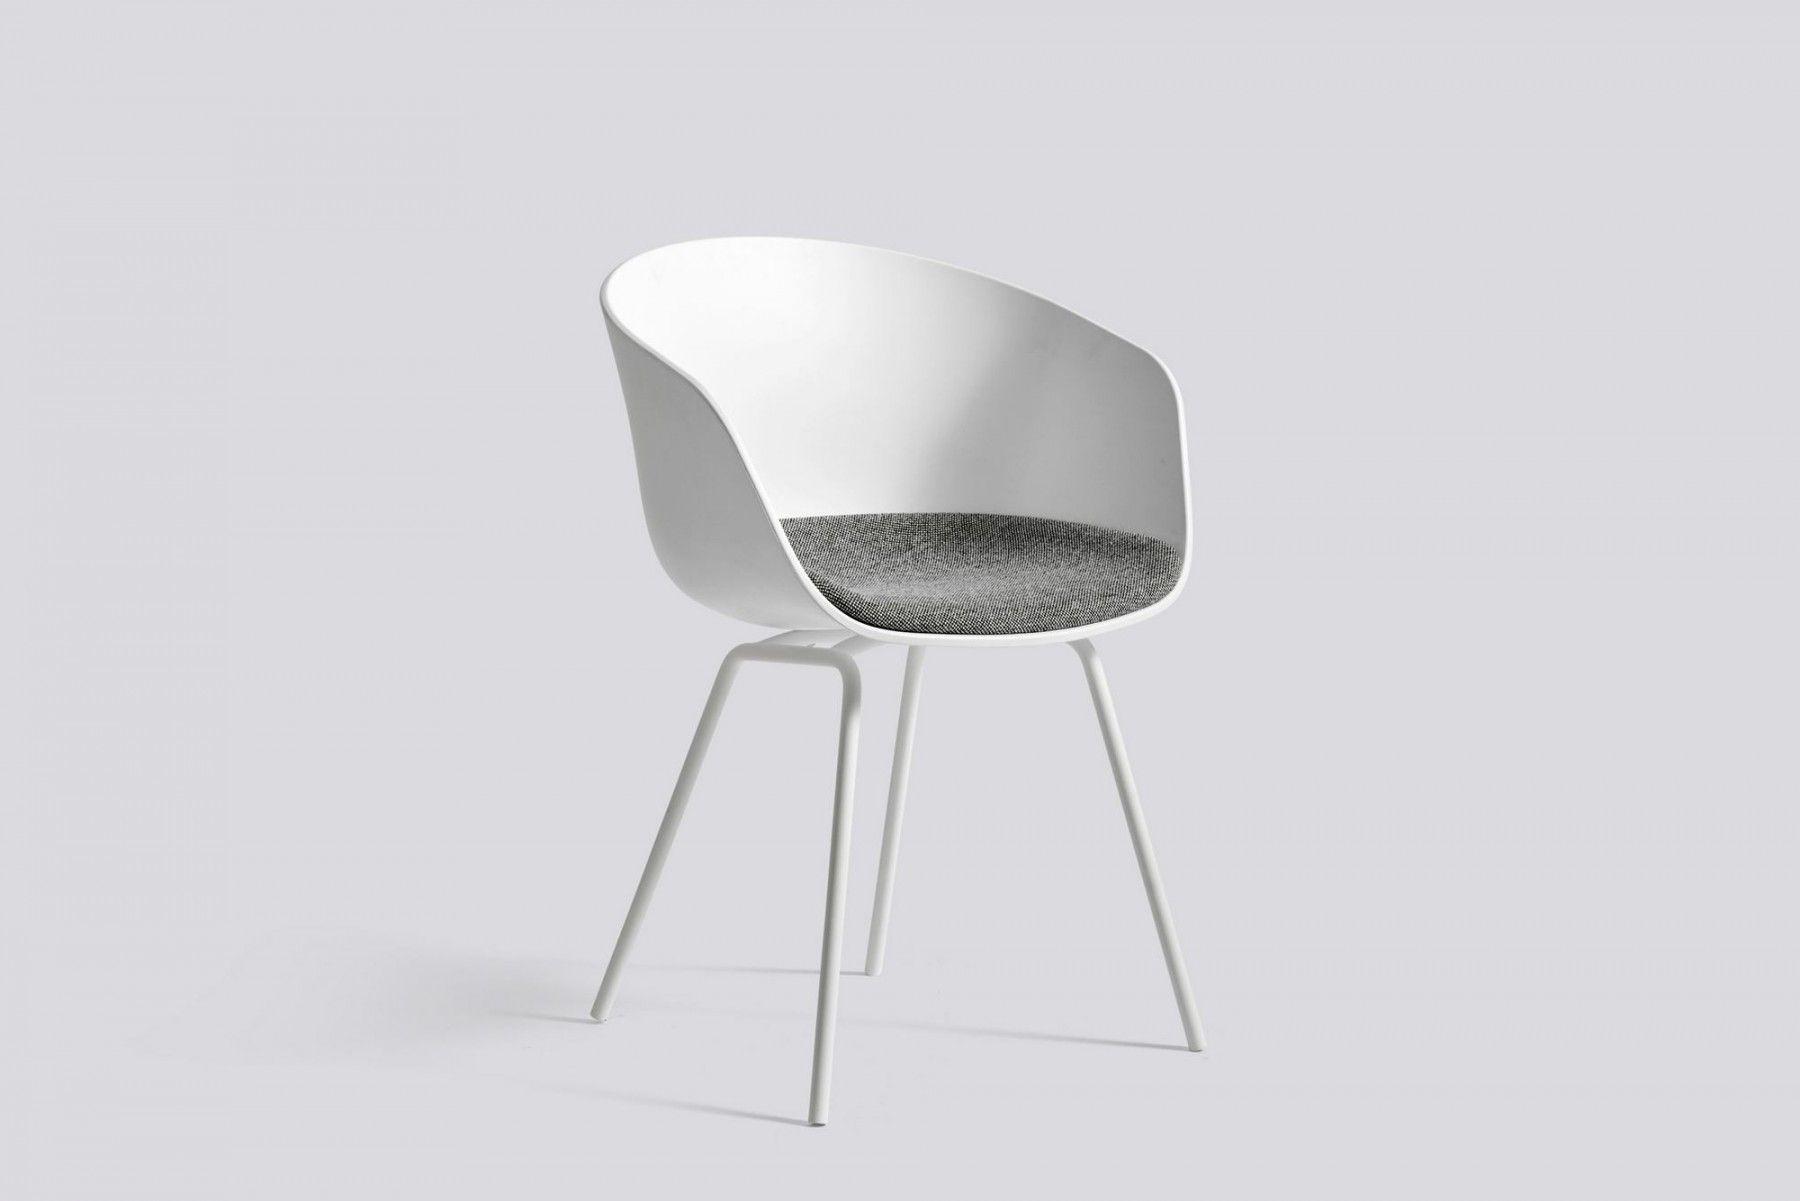 Hee welling trendy finest hee welling hay dining chair set of